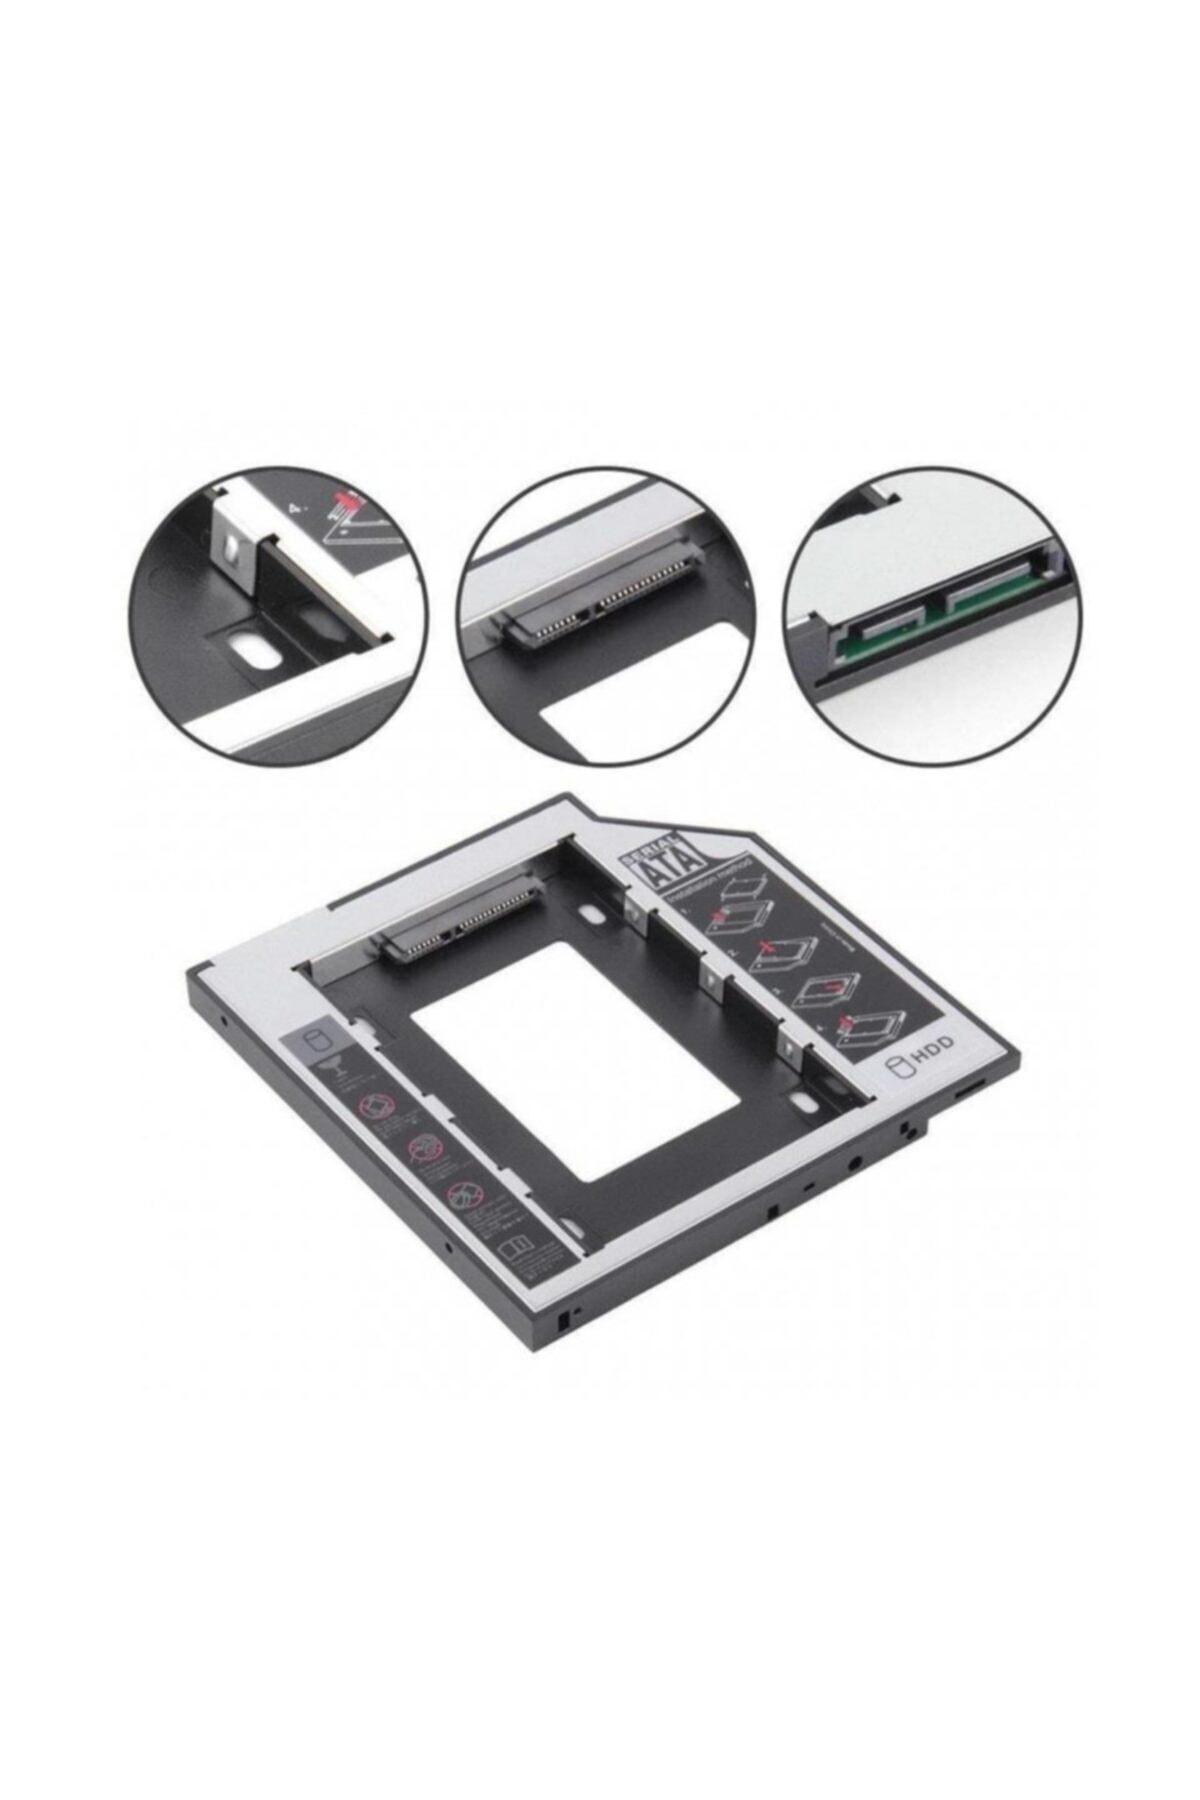 Concord 9.5mm Hdd Caddy Notebook Dvd Ssd Kutu Sata Laptop Notebook 2